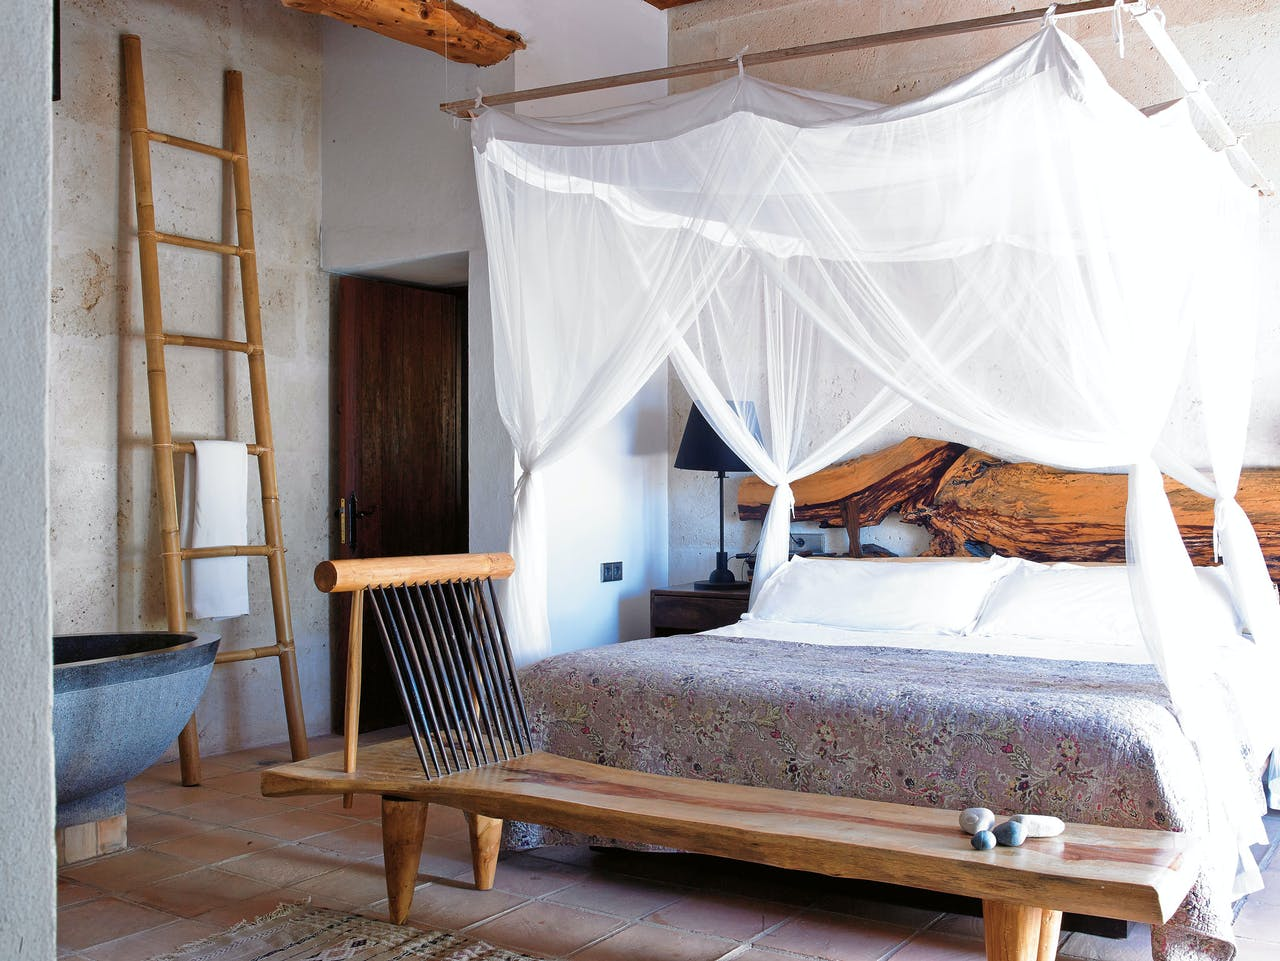 Een van de slaapkamers in Villa Uma op Ibiza. (Foto: Conrad White)